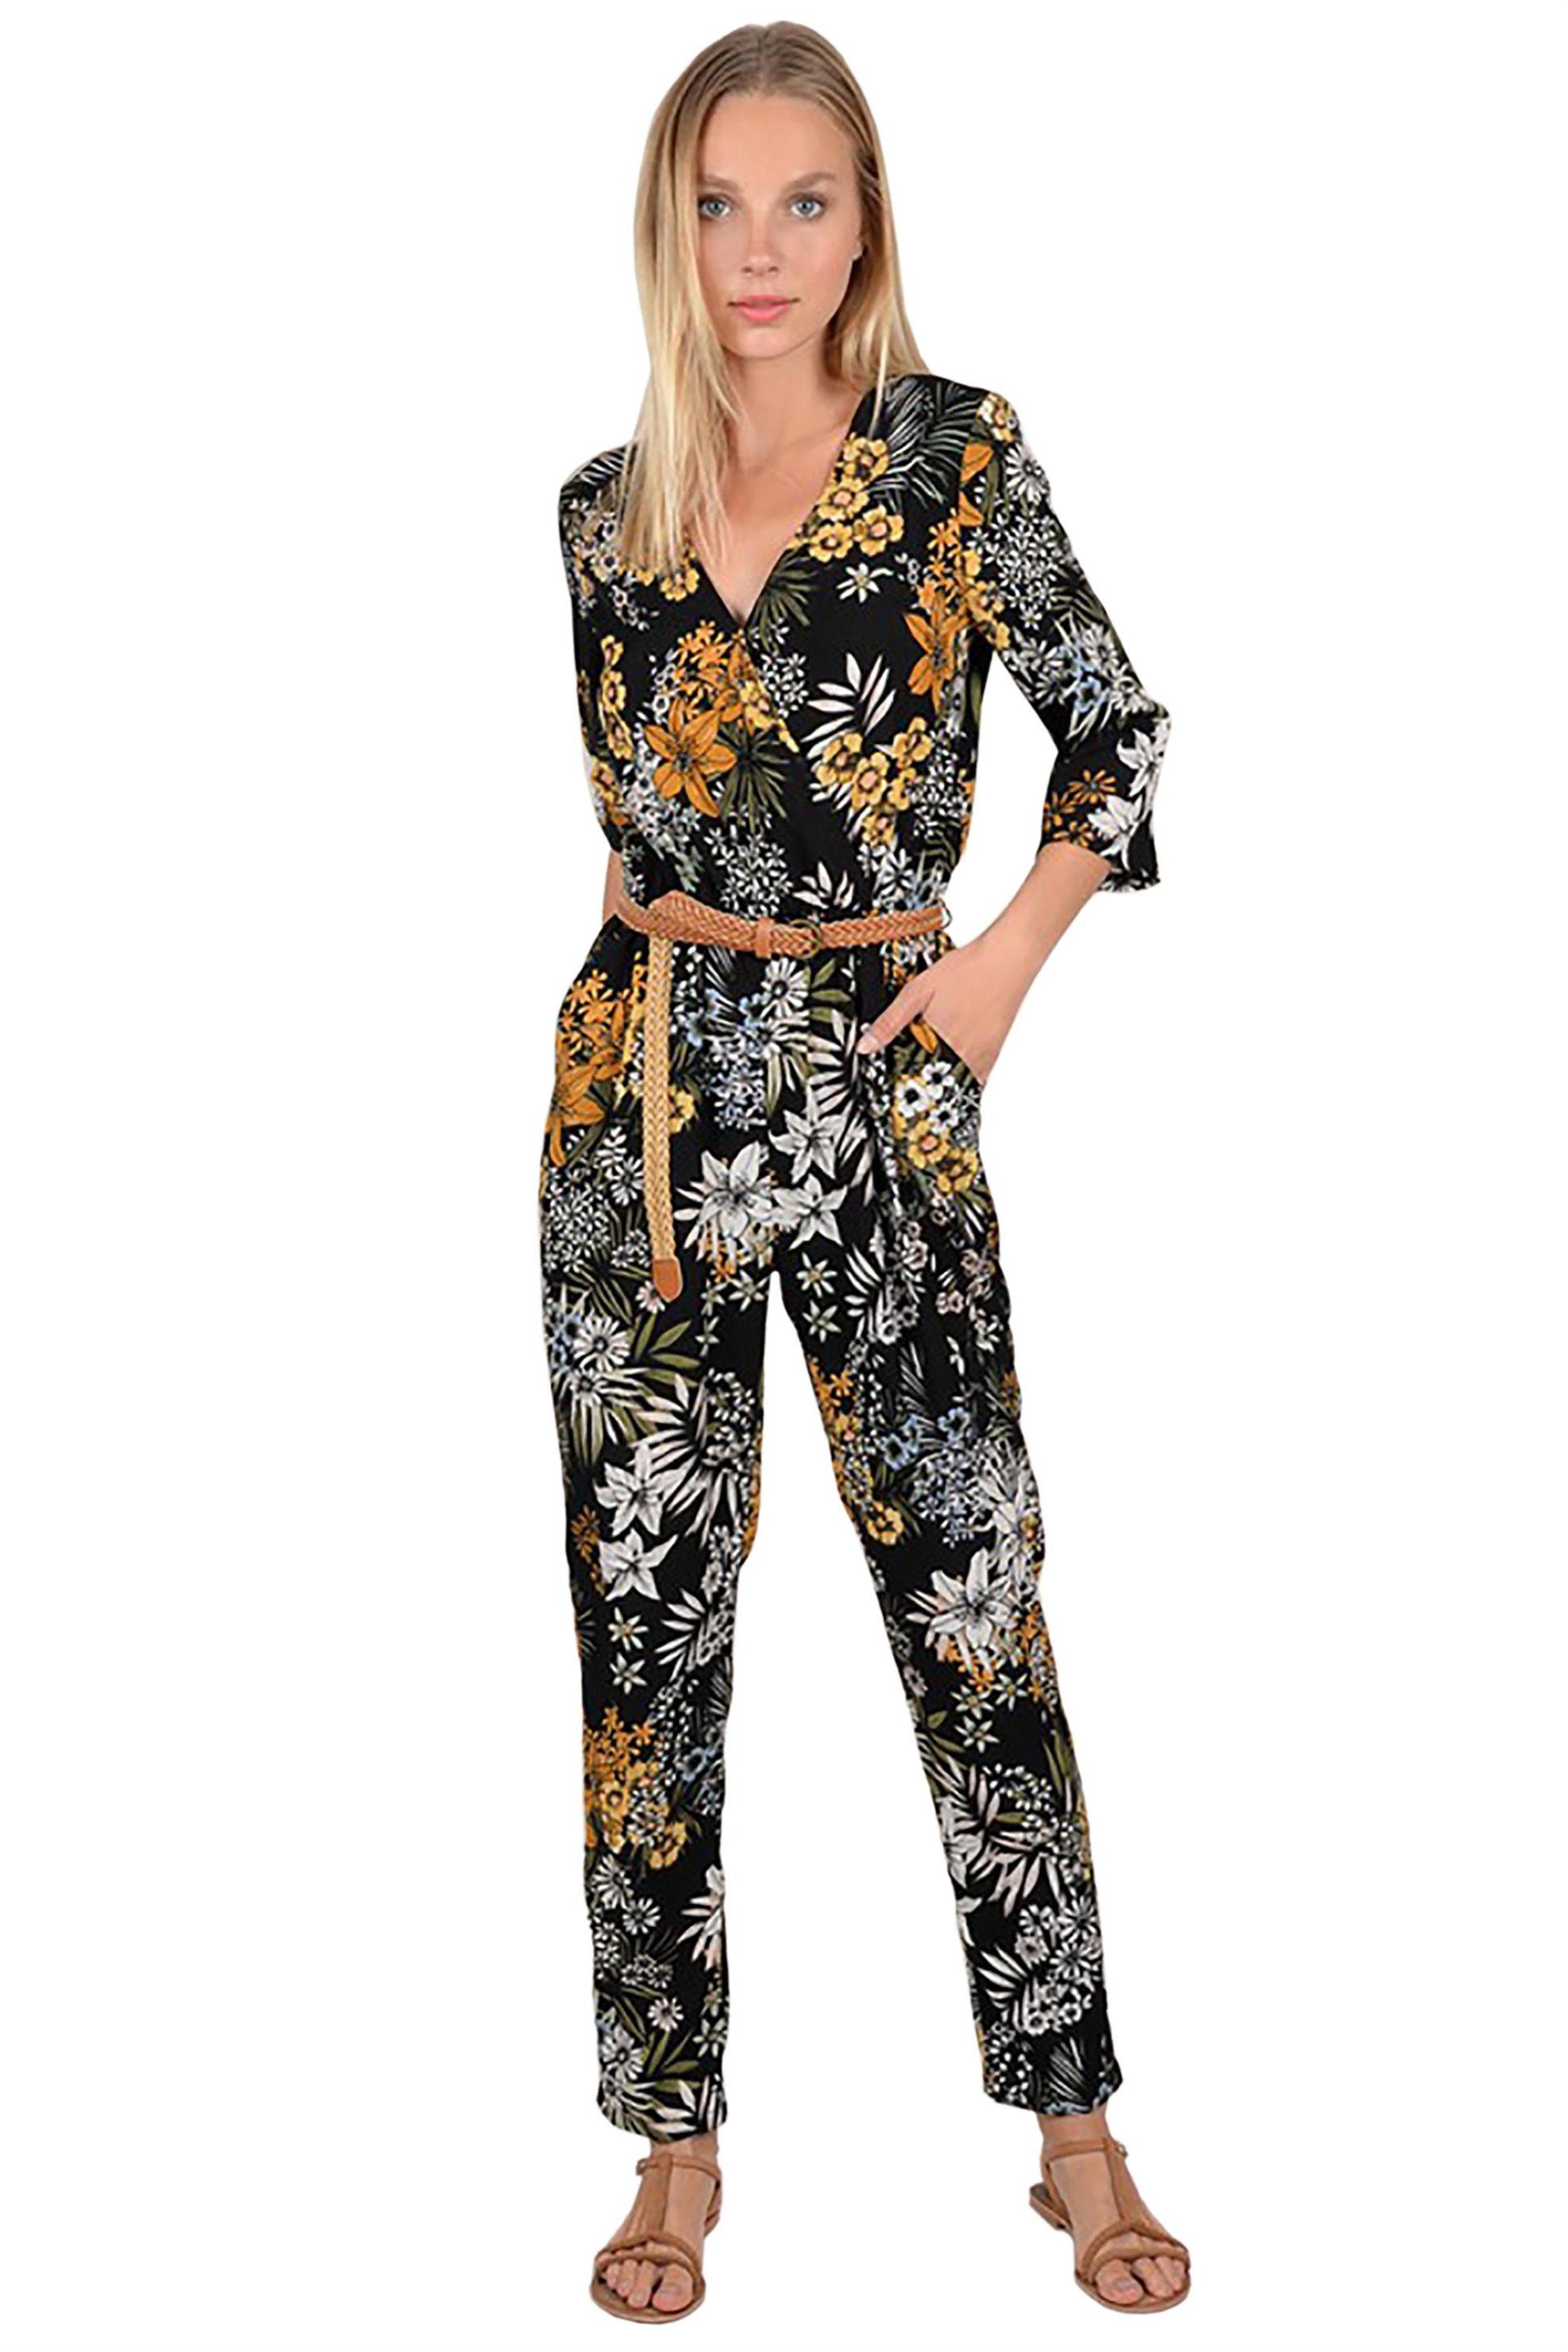 Molly Bracken γυναικεία εμπριμέ ολόσωμη φόρμα με πλεκτή ζώνη - S19MB-P983A - Μαύ γυναικα   ρουχα   ολόσωμες φόρμες   σαλοπέτες